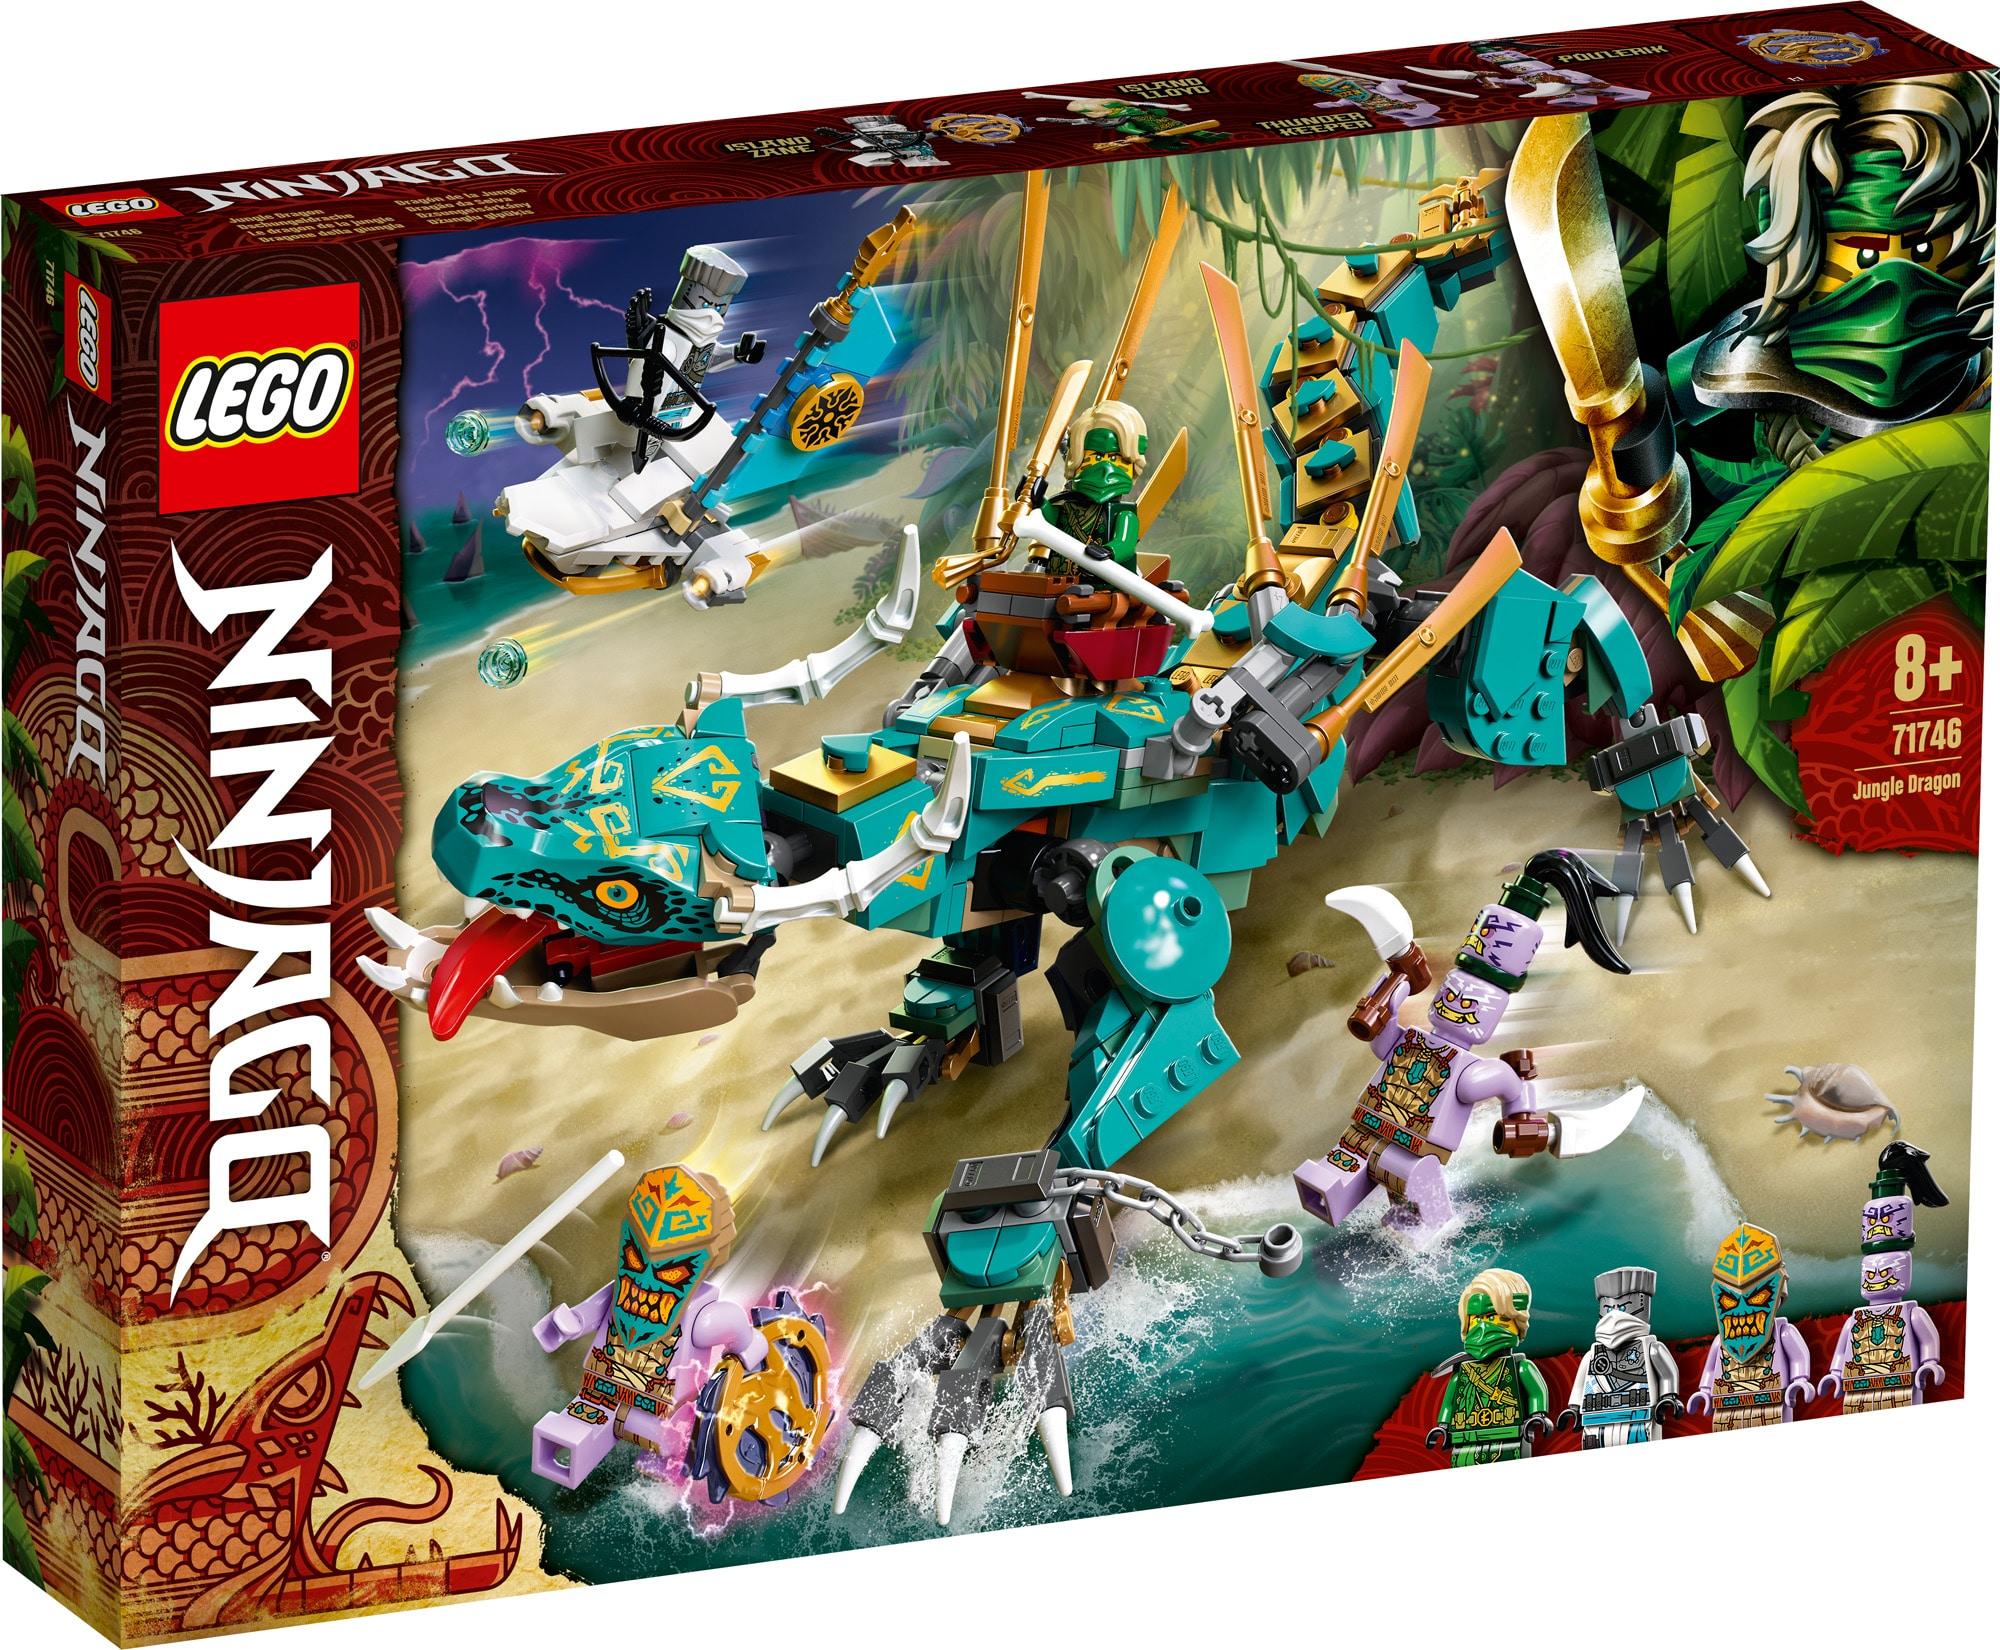 LEGO Ninjago 71746 Dschungel Drache 3